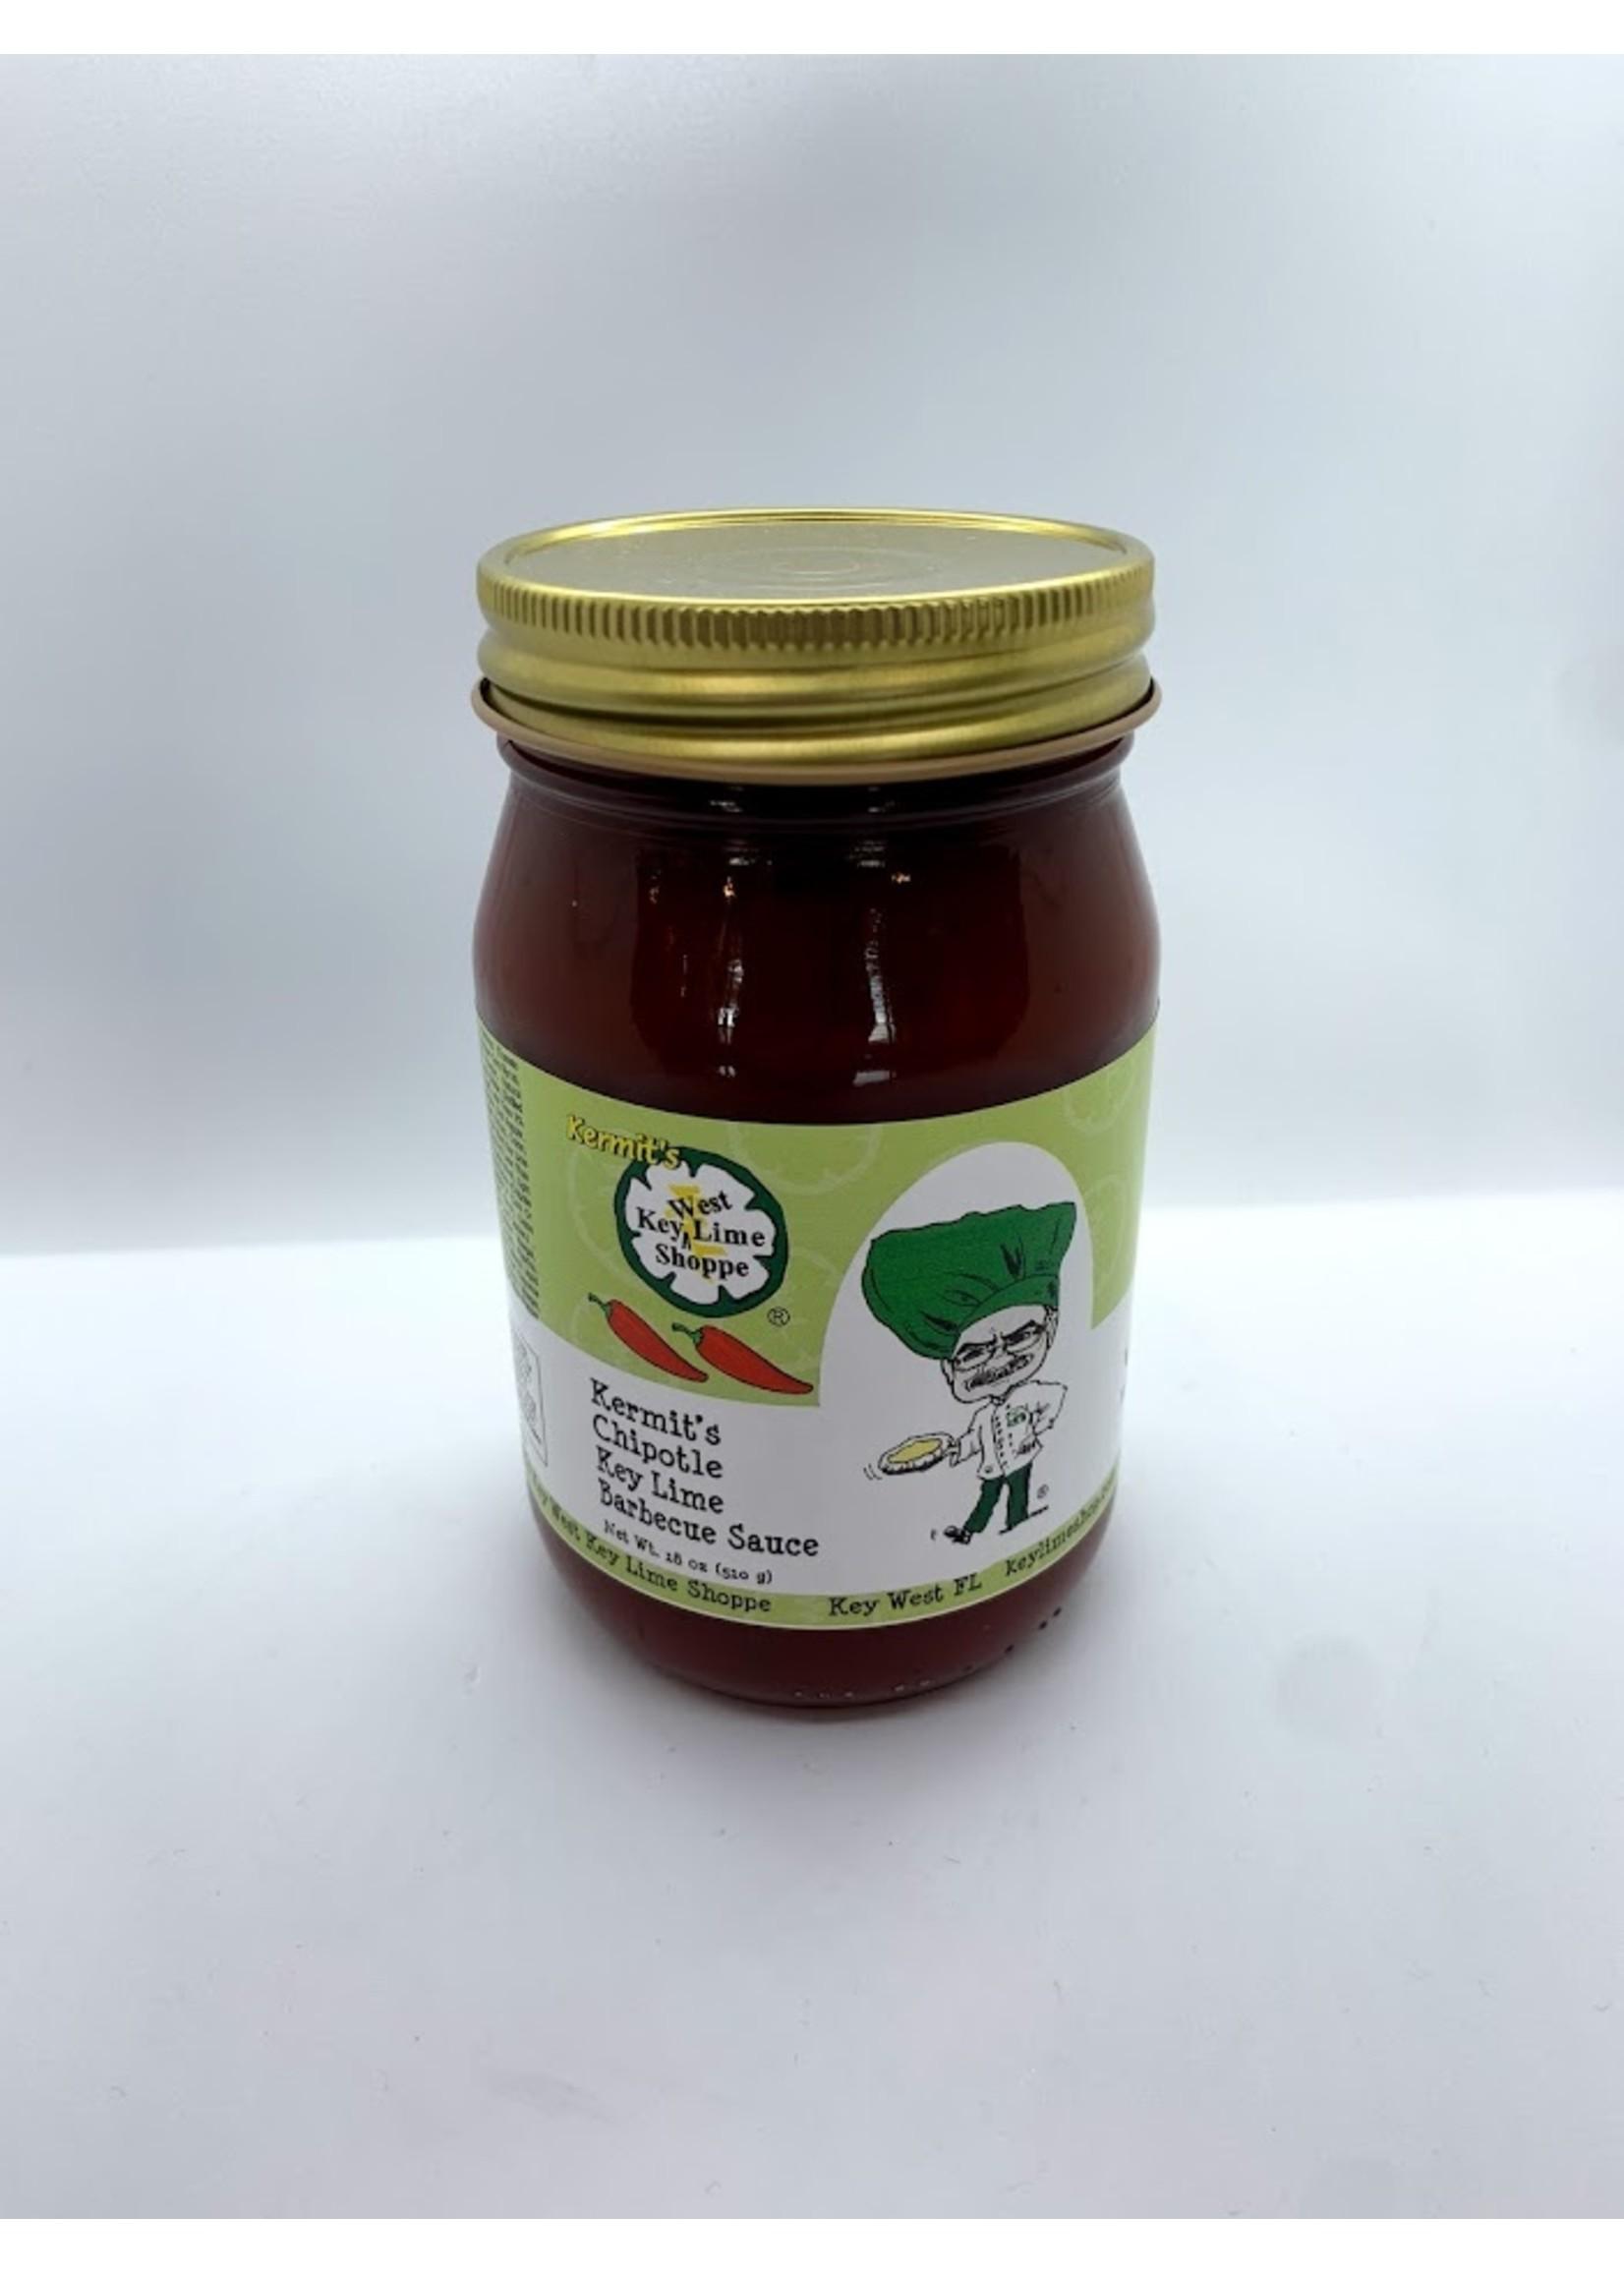 Kermit's Chipotle Key Lime Barbecue Sauce 18 oz.